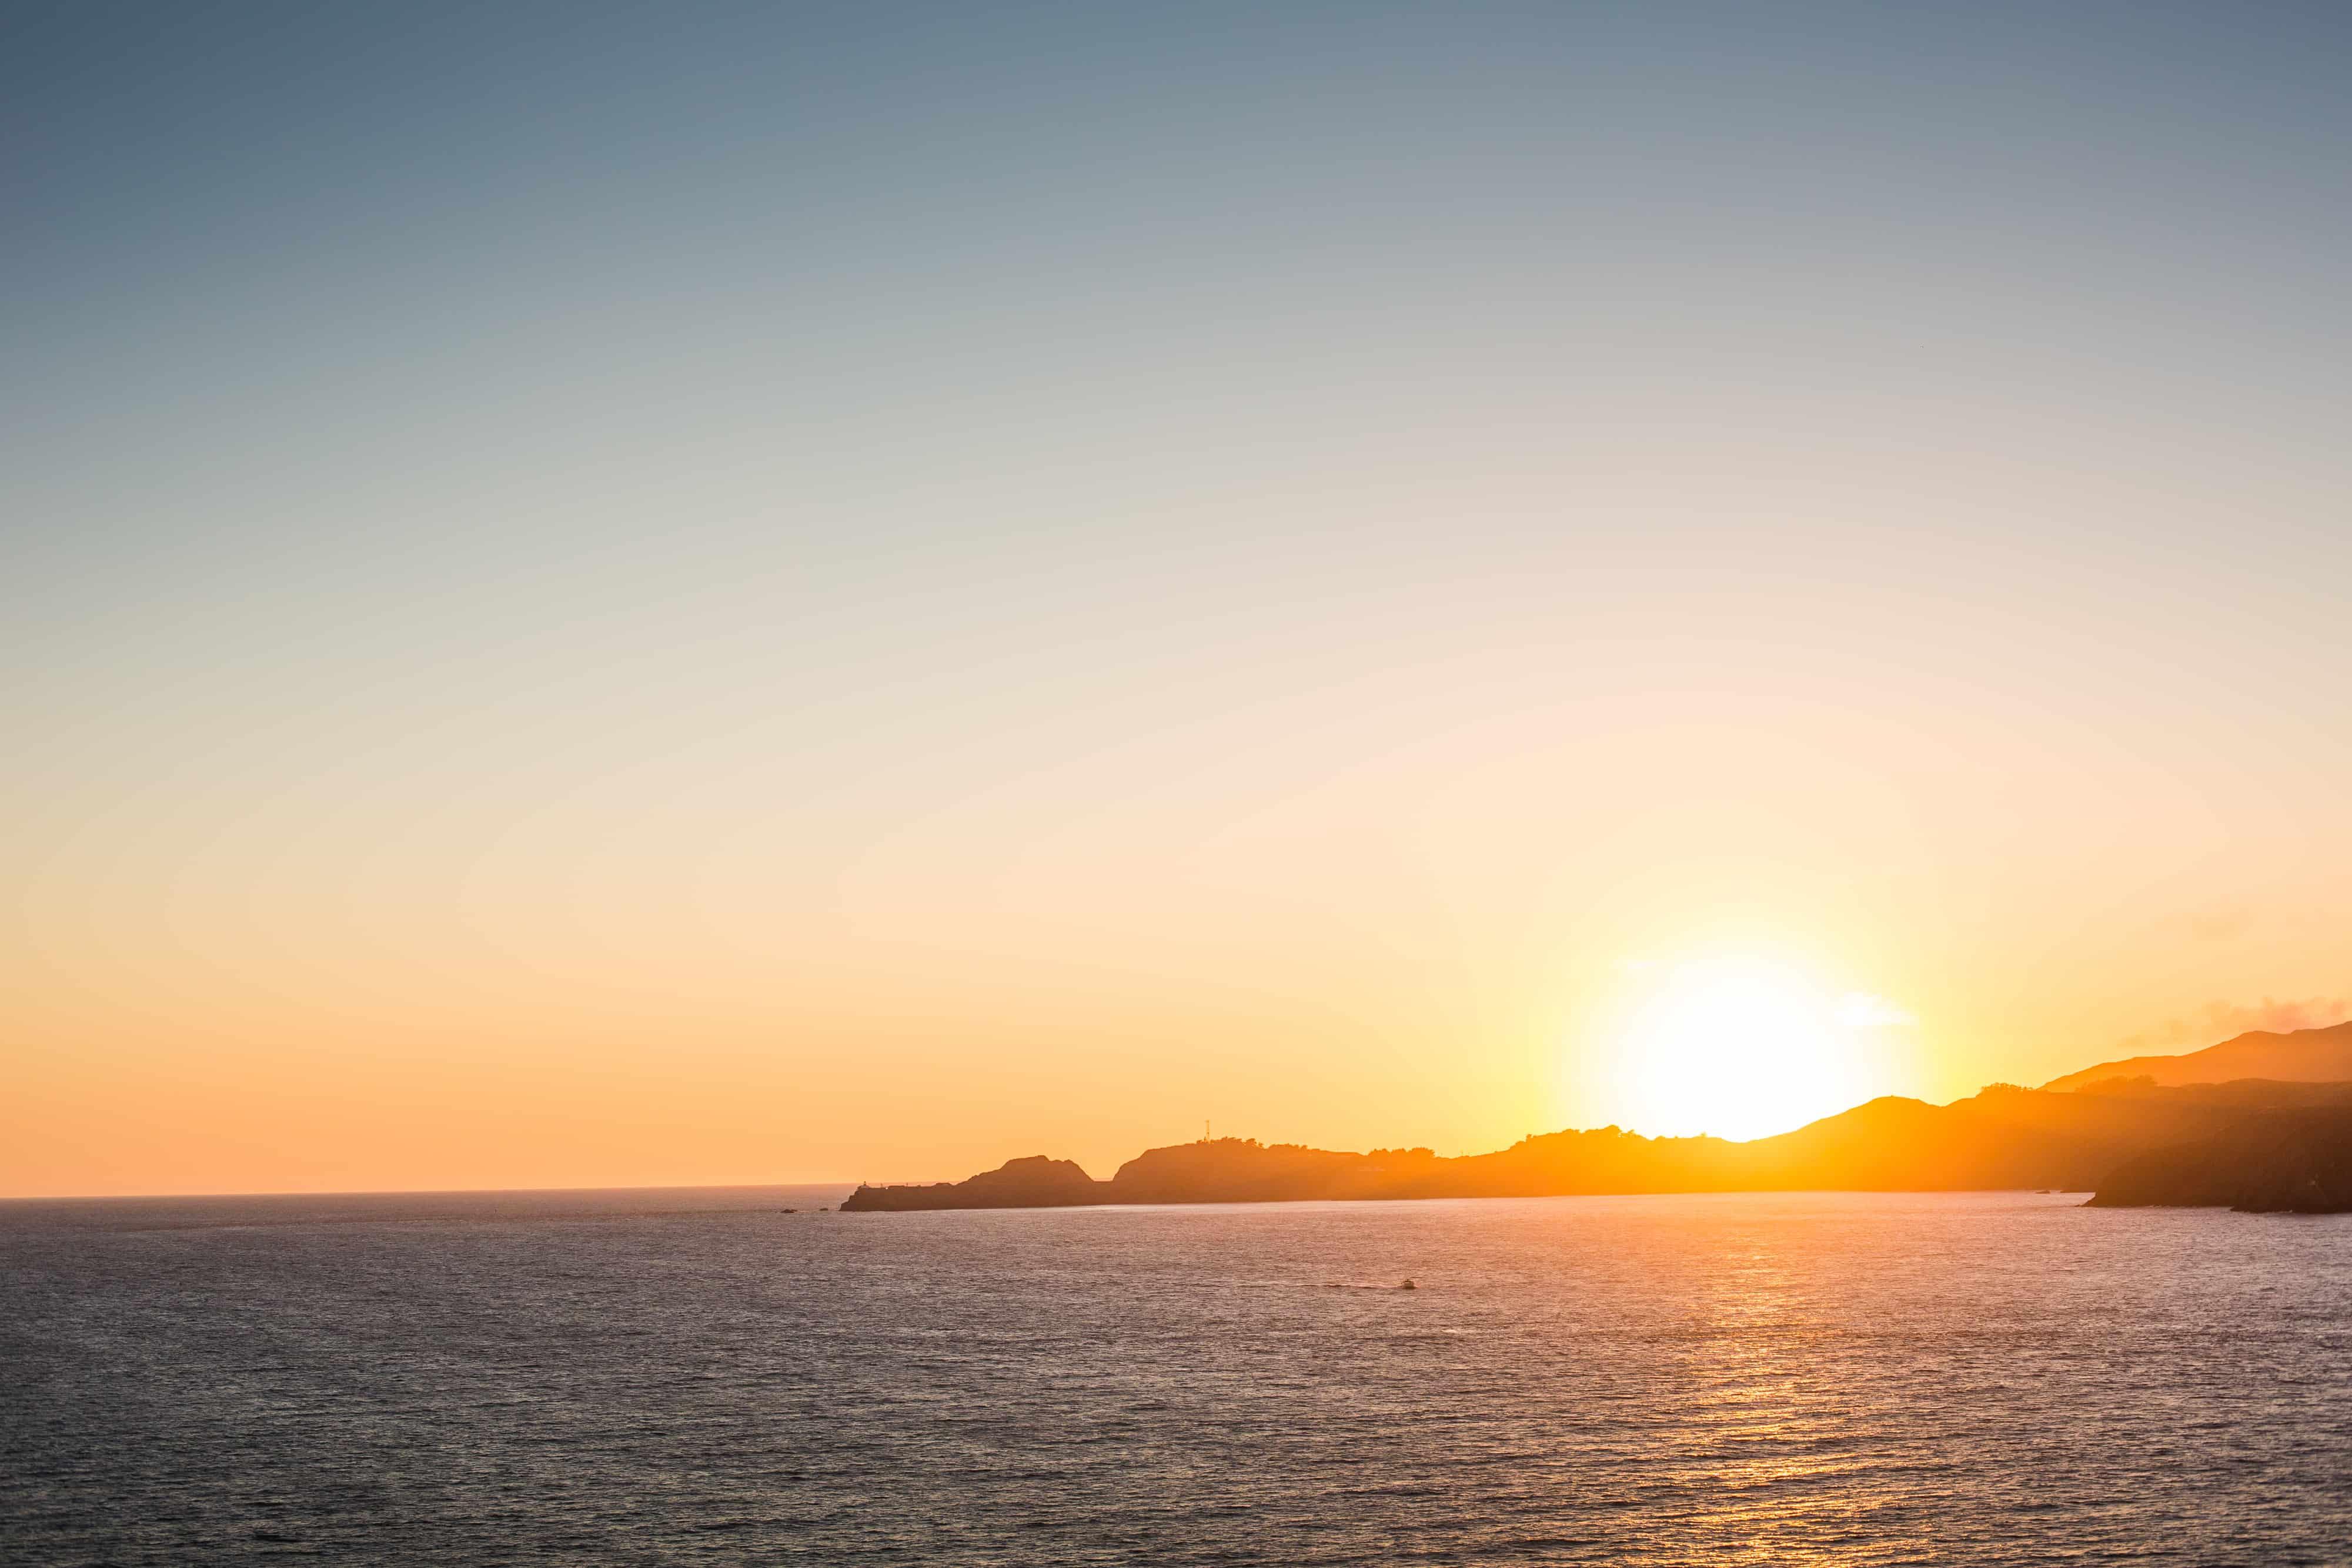 beautiful-sunset-over-the-oceanside-picjumbo-com